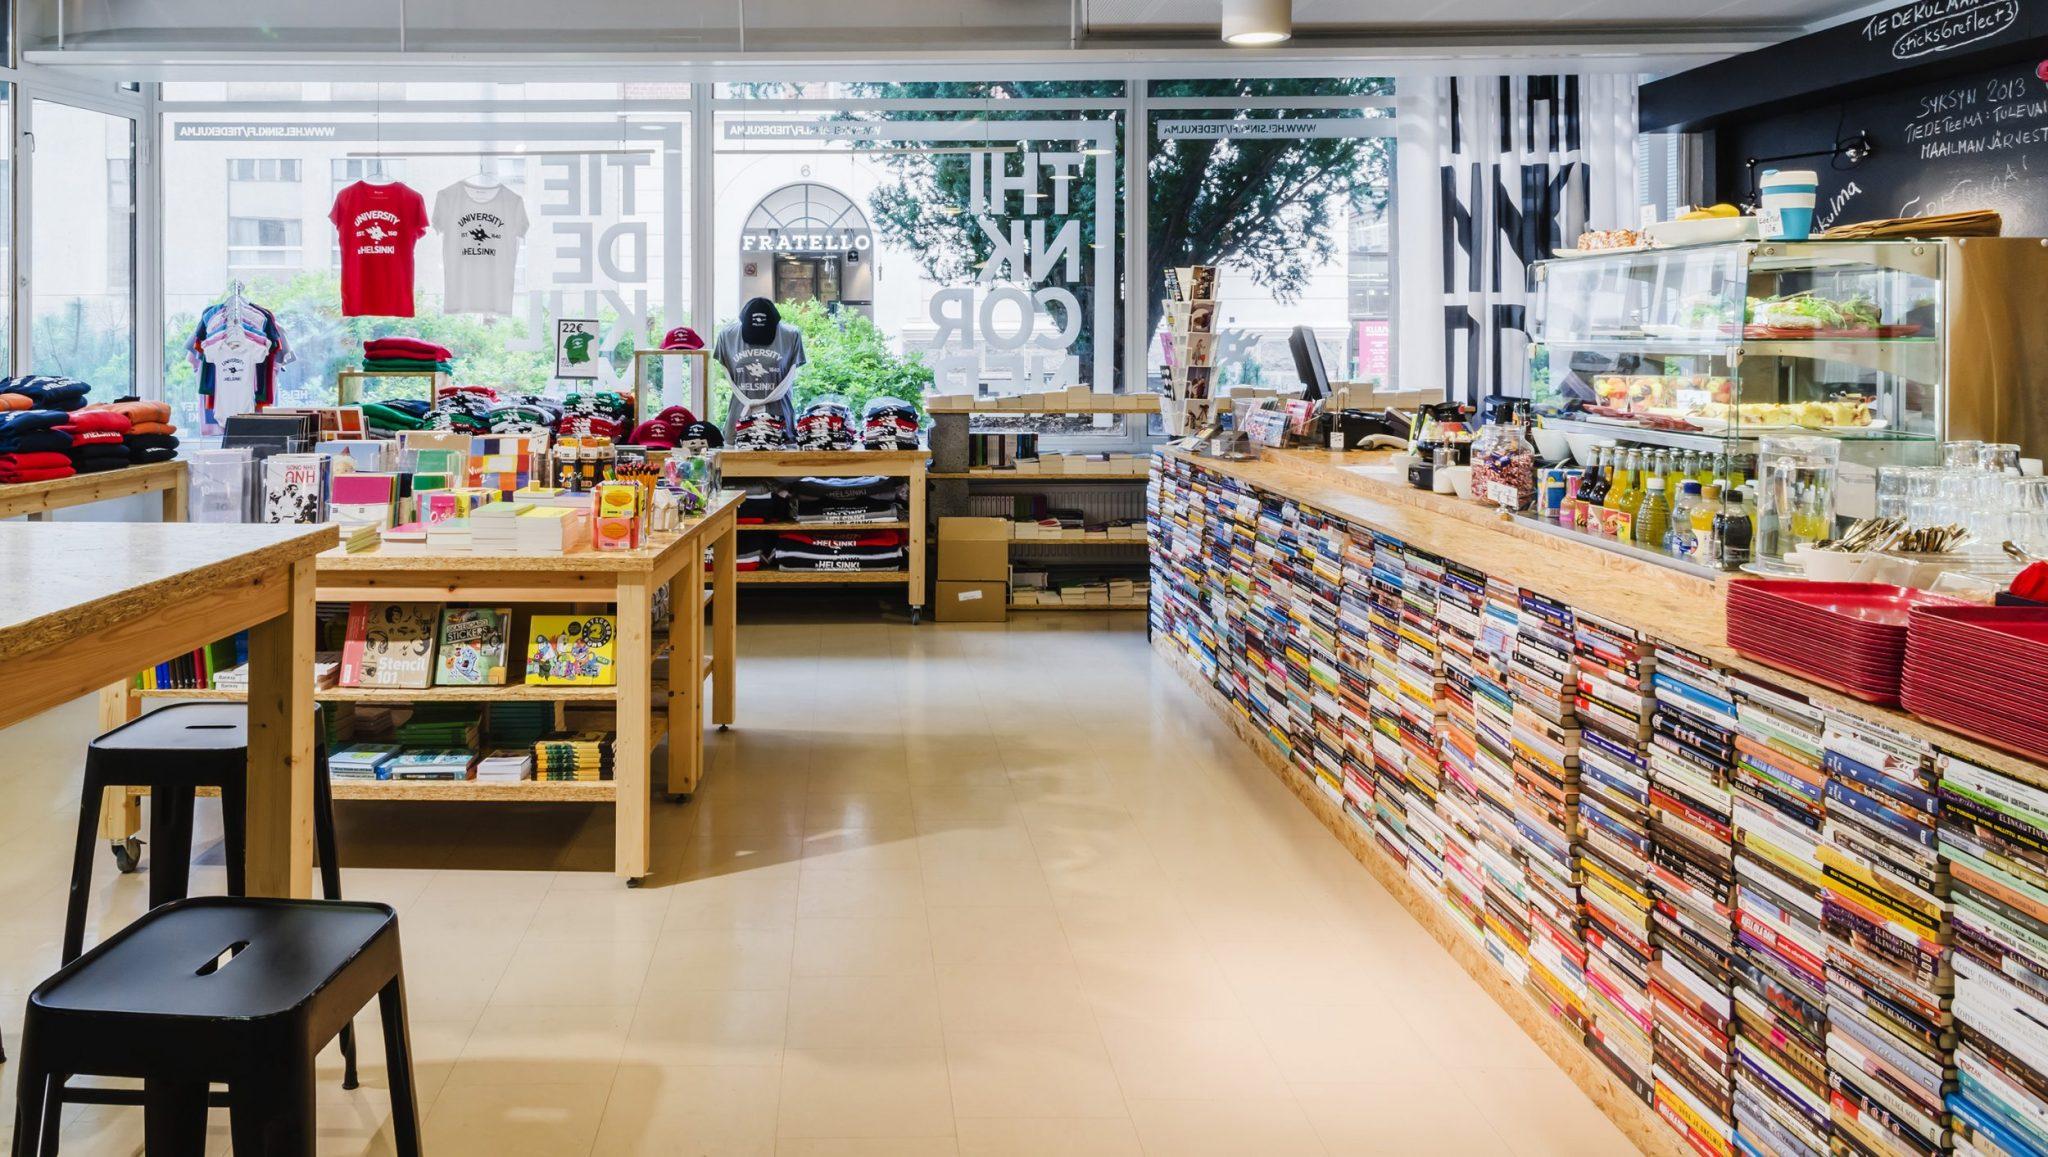 Think-Corner-pop-up-store-Aleksanterinkatu-Helsinki-GI-Project-4